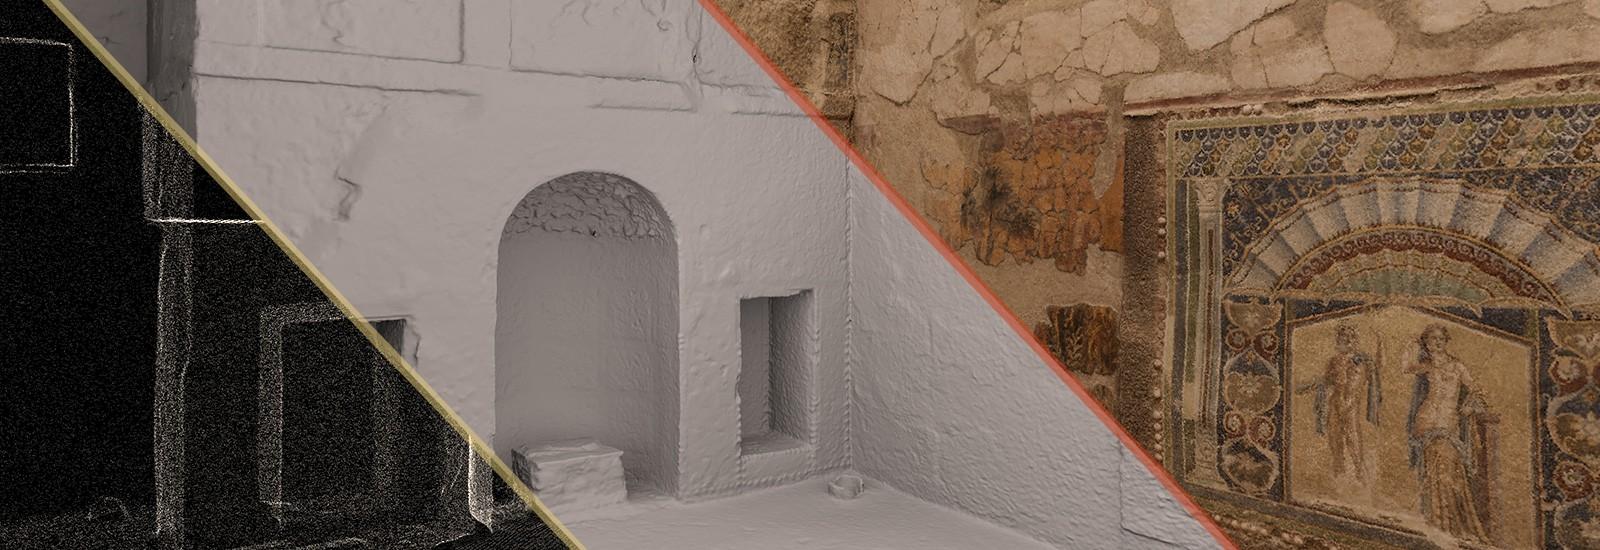 Archeotransfert 3D modélisation archéologie Aquitaine